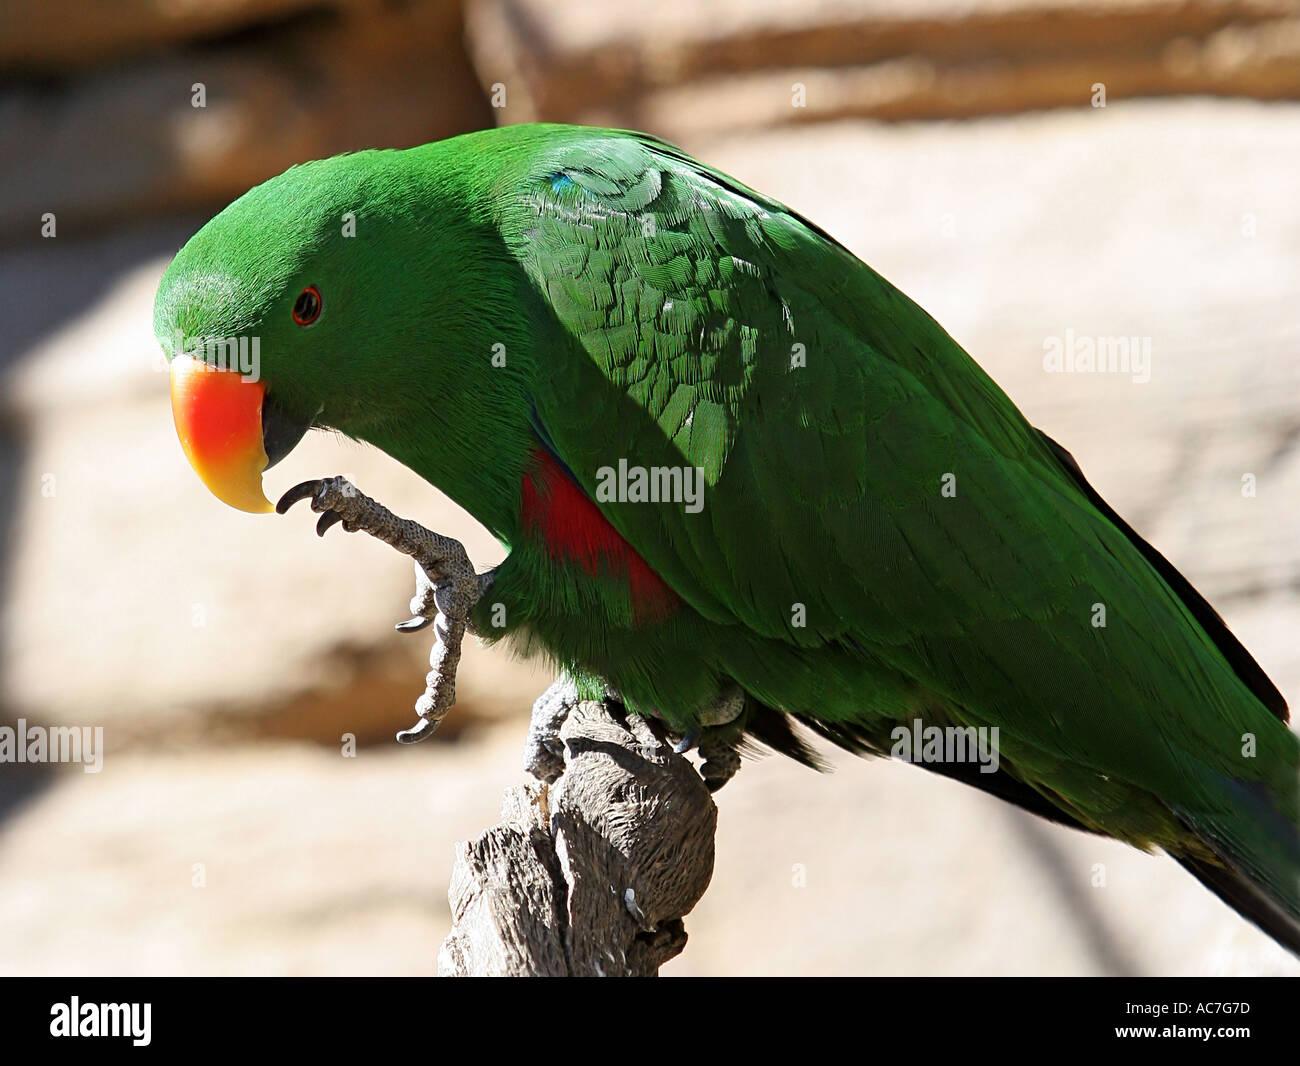 Green Parrot cleaning beak